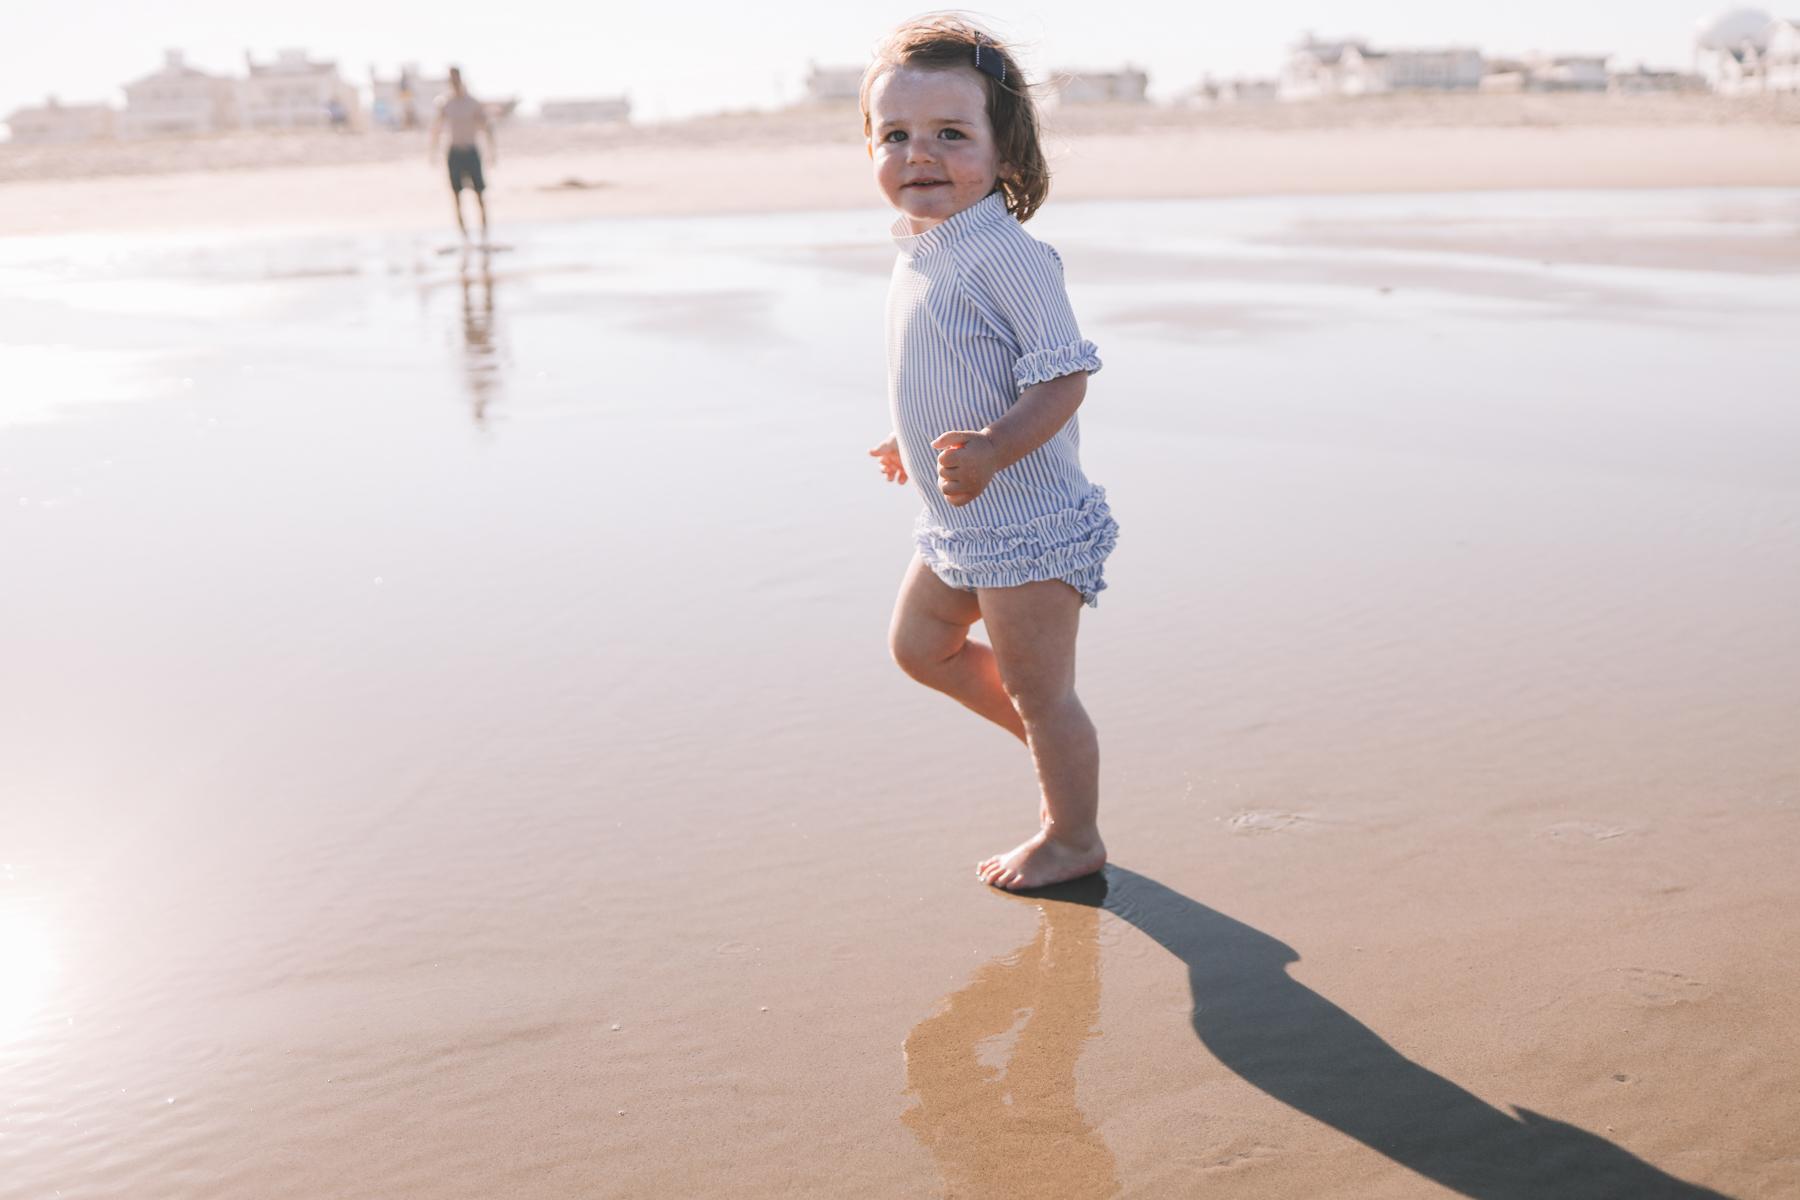 Ocean City Beach Days with little kids